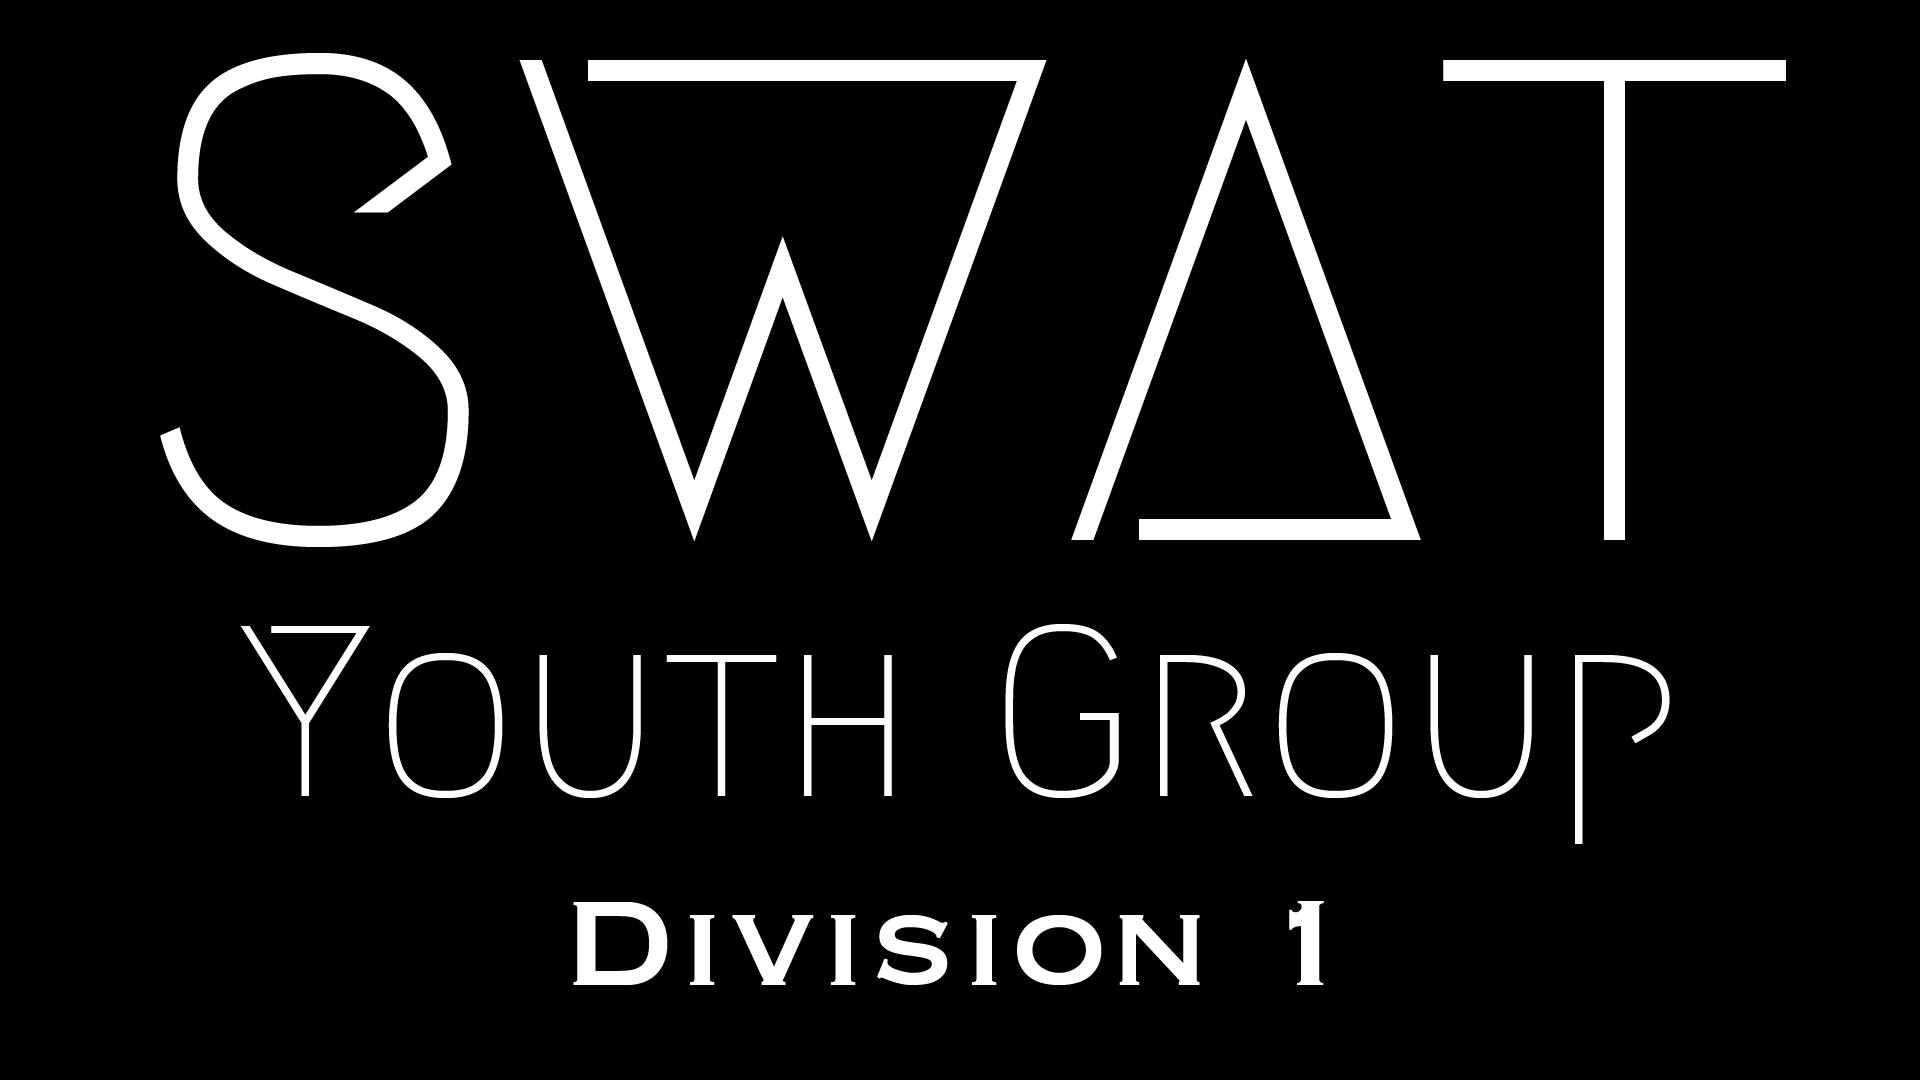 SWAT LOGO (D1)-01.jpg